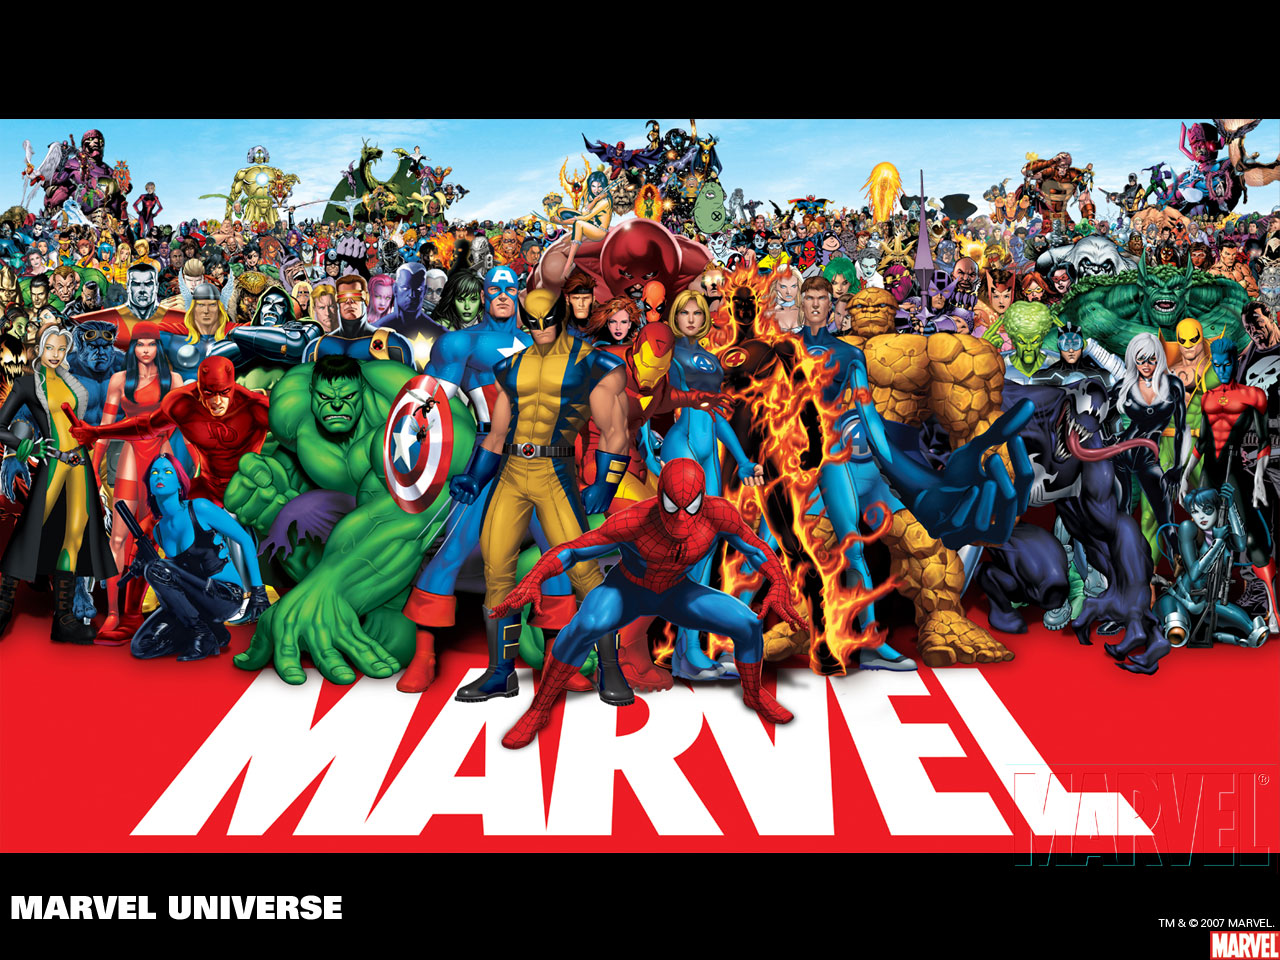 http://3.bp.blogspot.com/-tO71wUS0mIE/T6tXaw3lcRI/AAAAAAAAAEE/1T3yCZSsN54/s1600/Marvel-Universe-Team.jpg